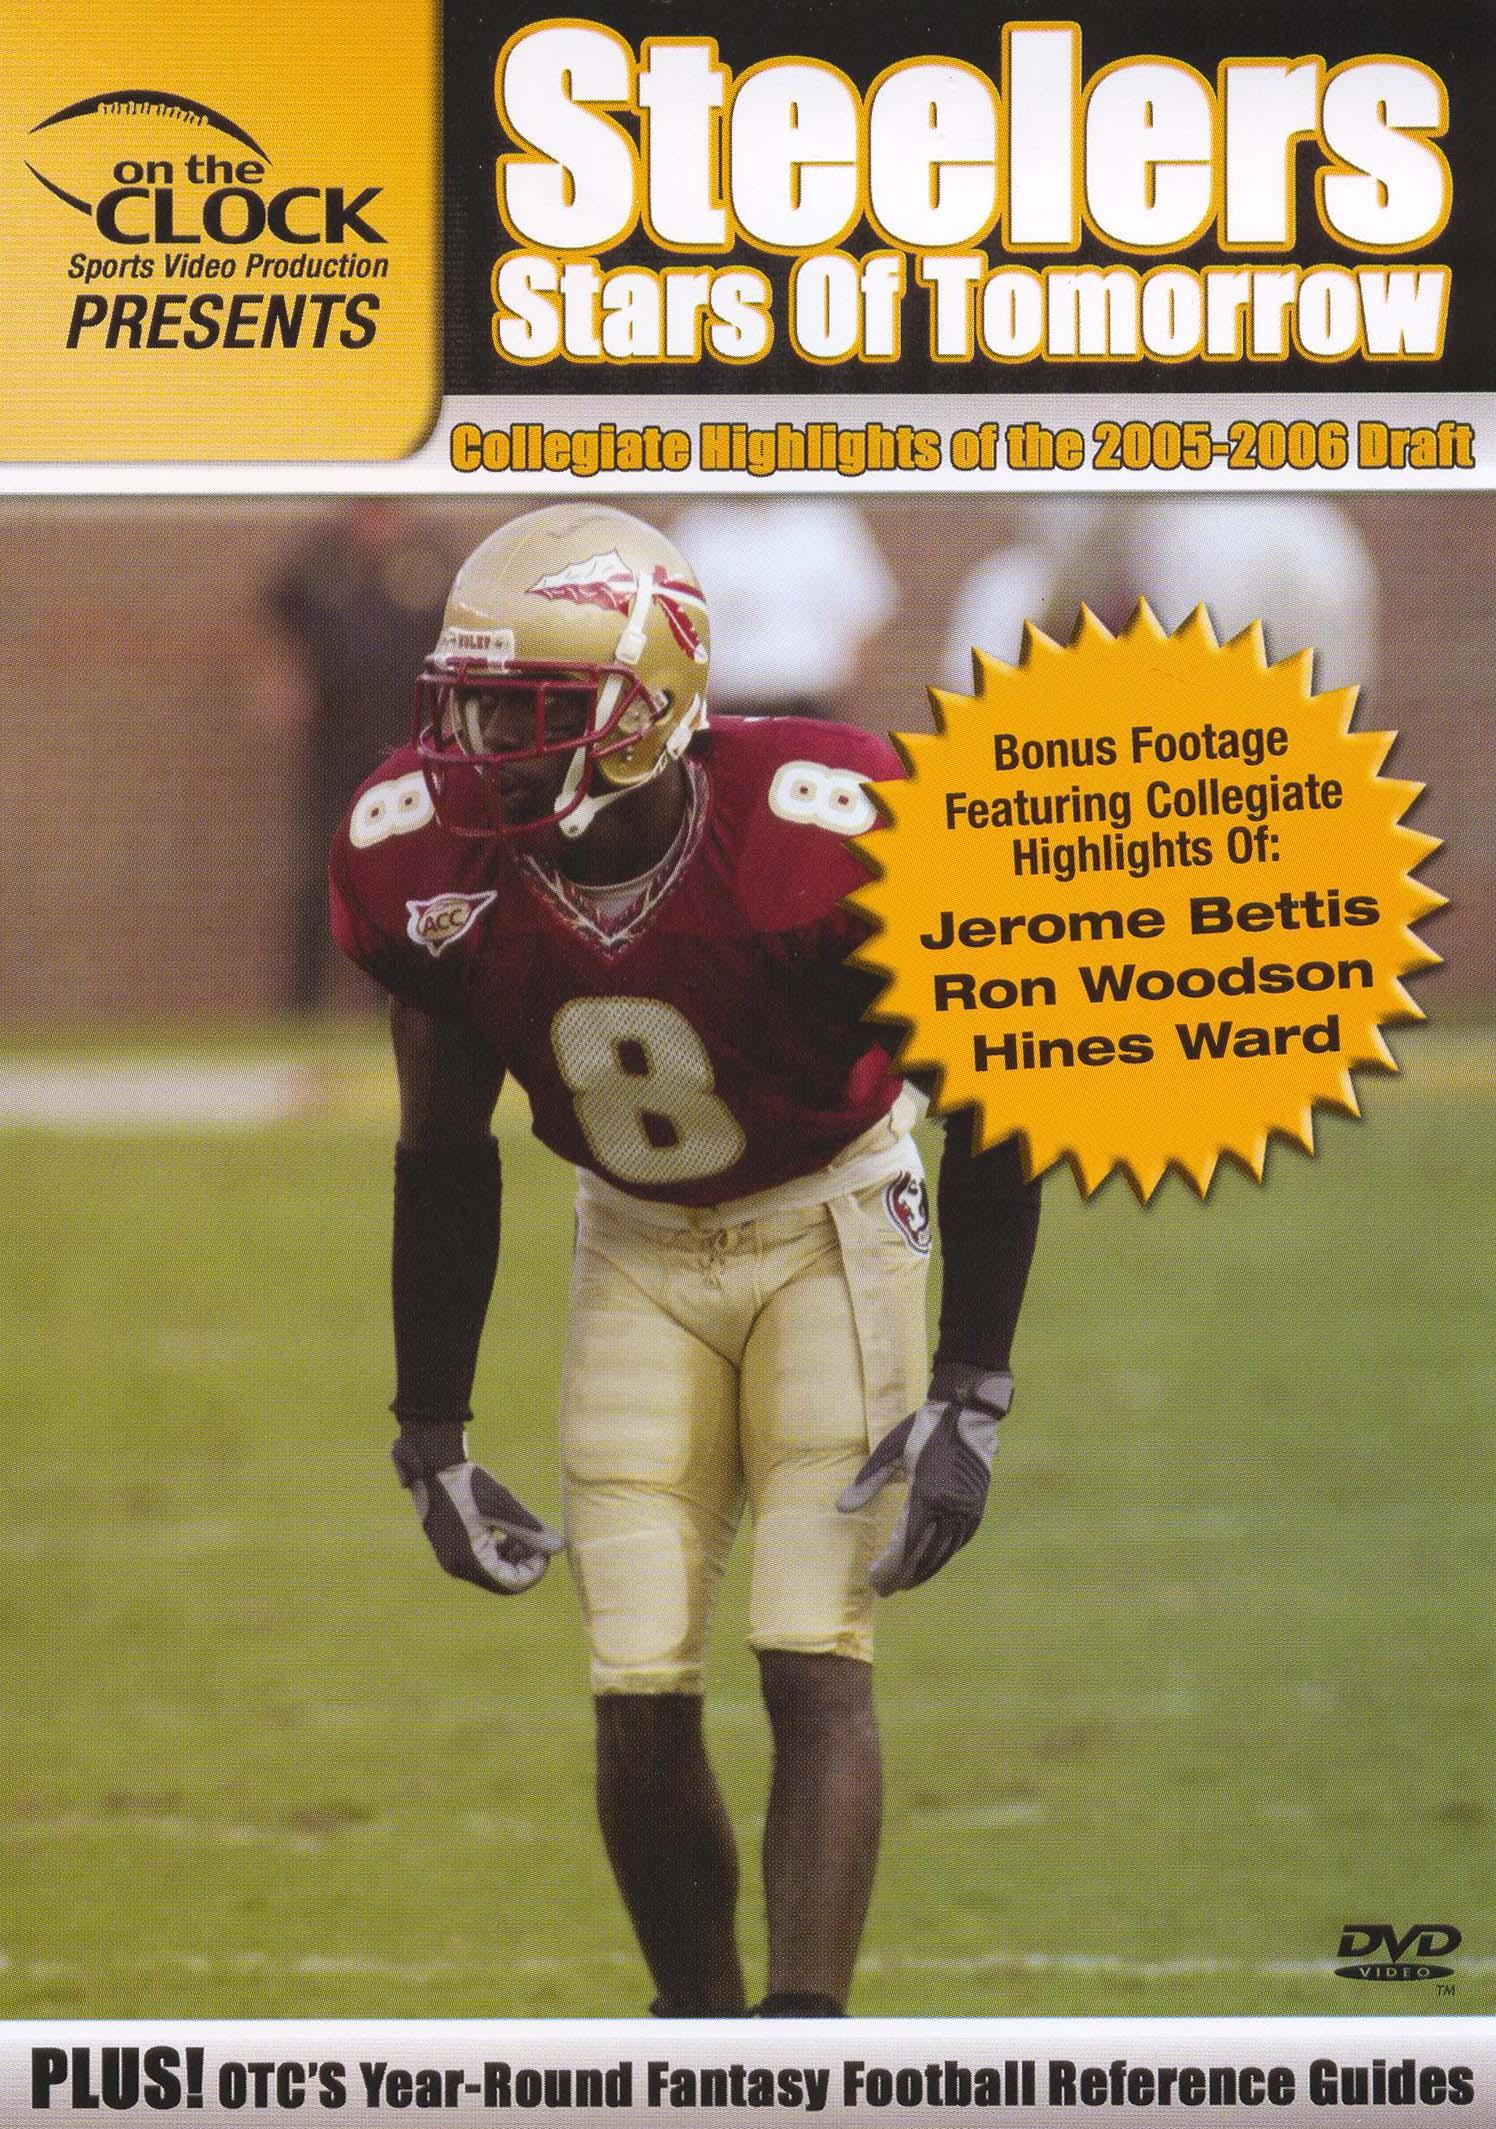 On the Clock Presents: Steelers - 2005 Draft Picks Collegiate Highlights